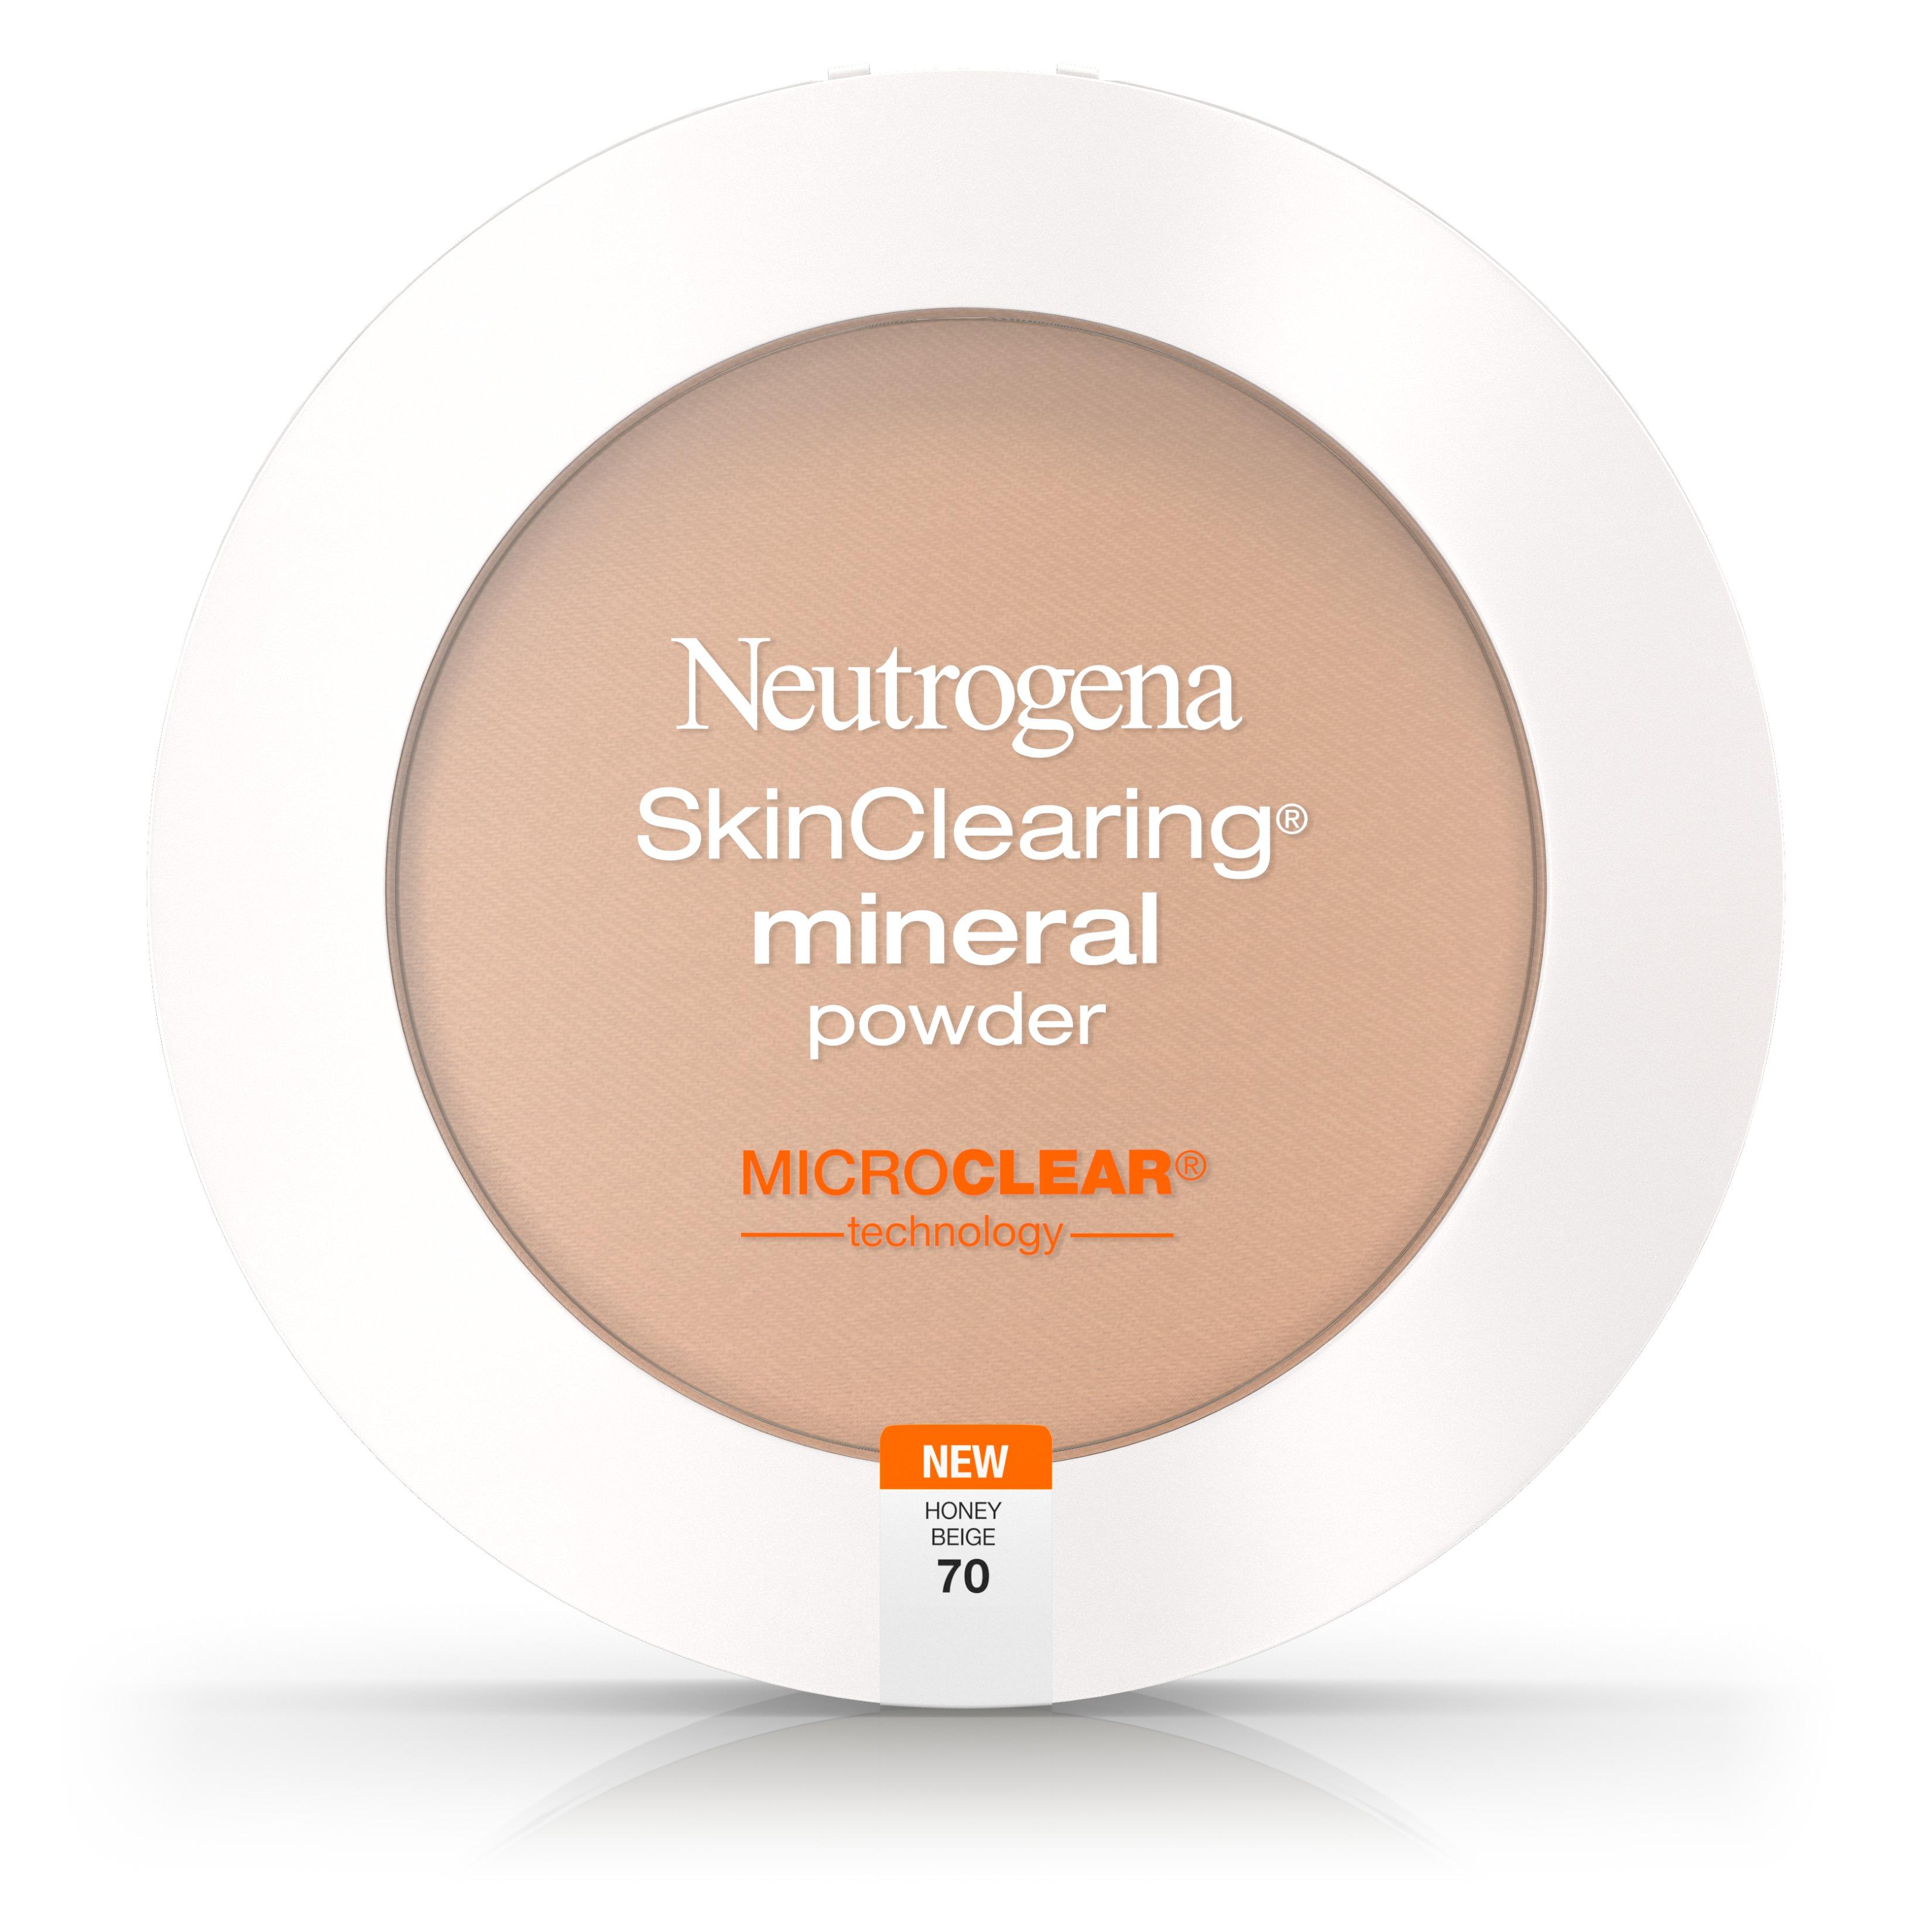 Neutrogena Skinclearing Mineral Powder, Classic Ivory 10,.34 Oz